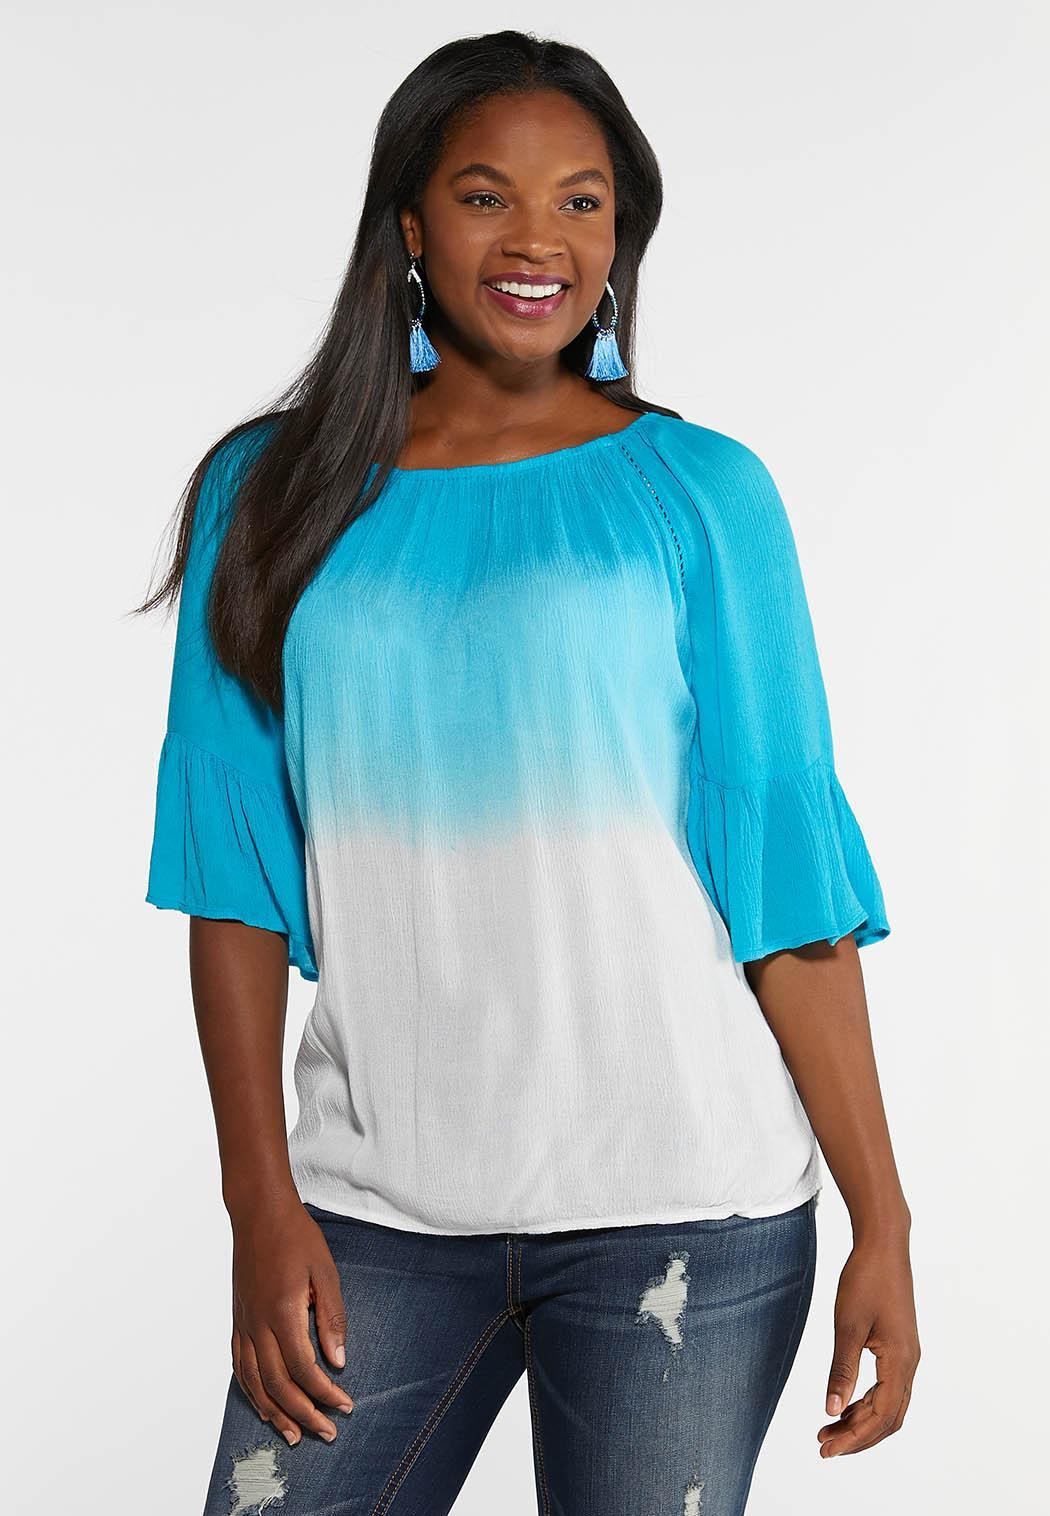 bbd80c28398 Plus Size Blue Ombre Gauze Top Shirts   Blouses Cato Fashions